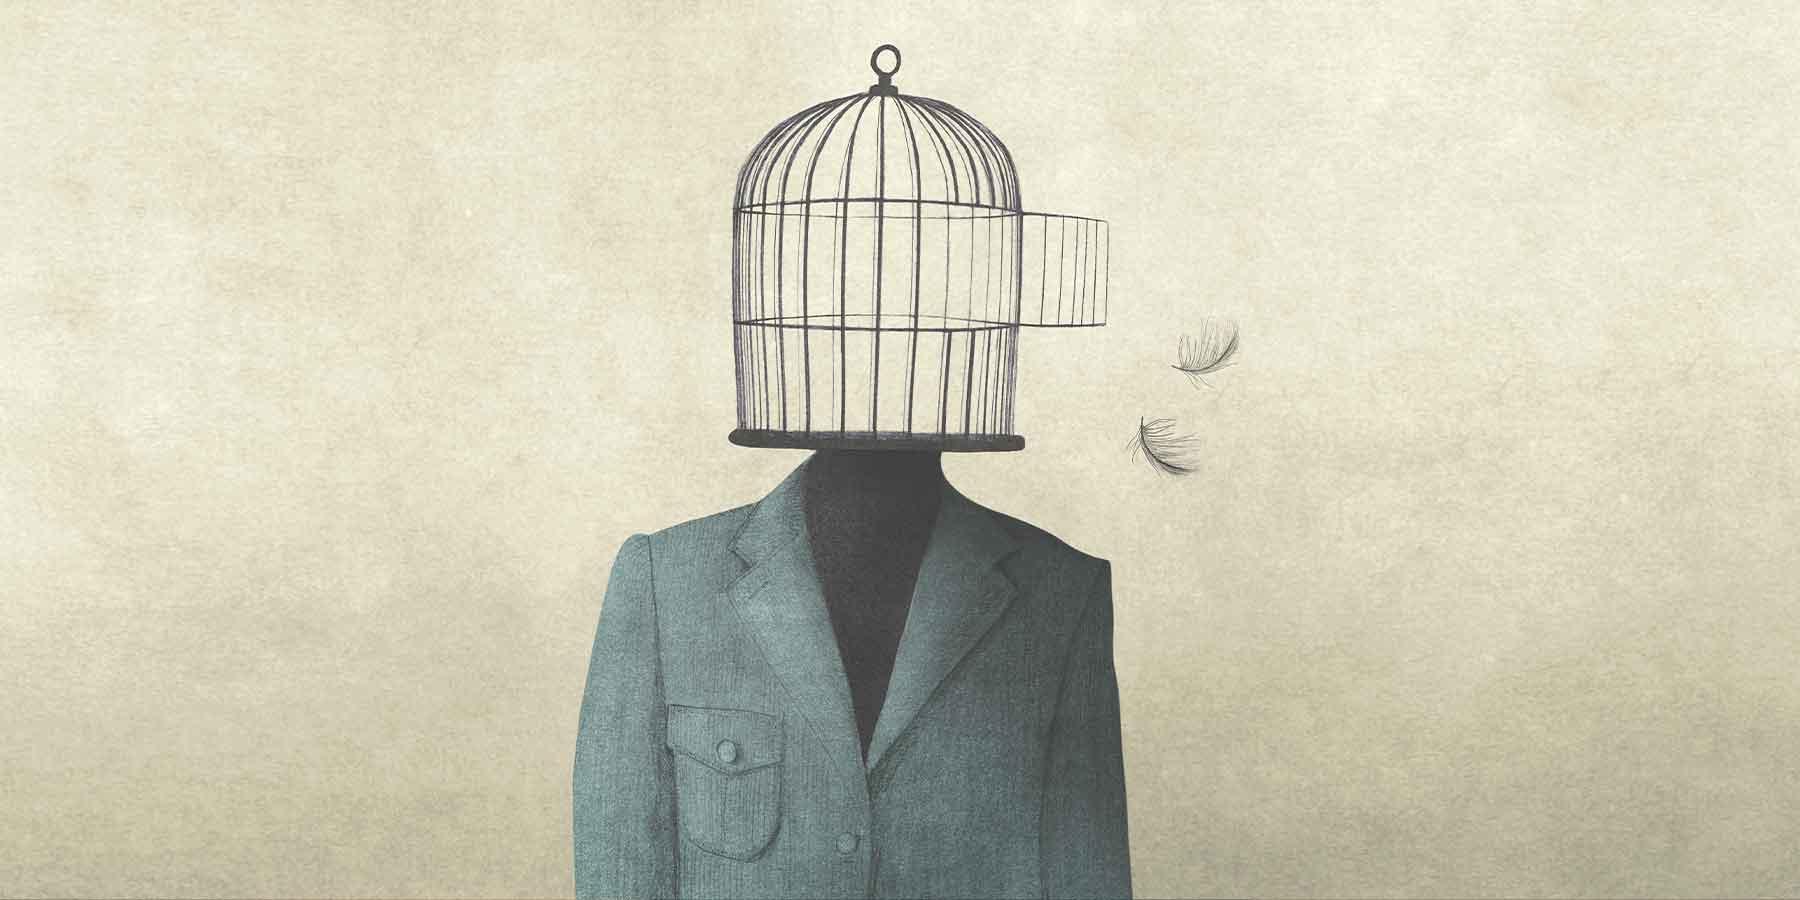 Prisoners are we - by Dada JP Vaswani